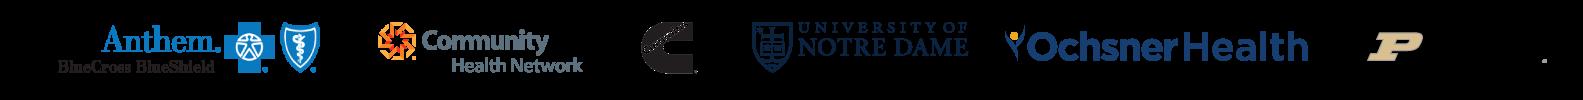 Trusted By Anthem, Community Health Network, Cummins, University of Notre Dame, Ochsner Health and Purdue University